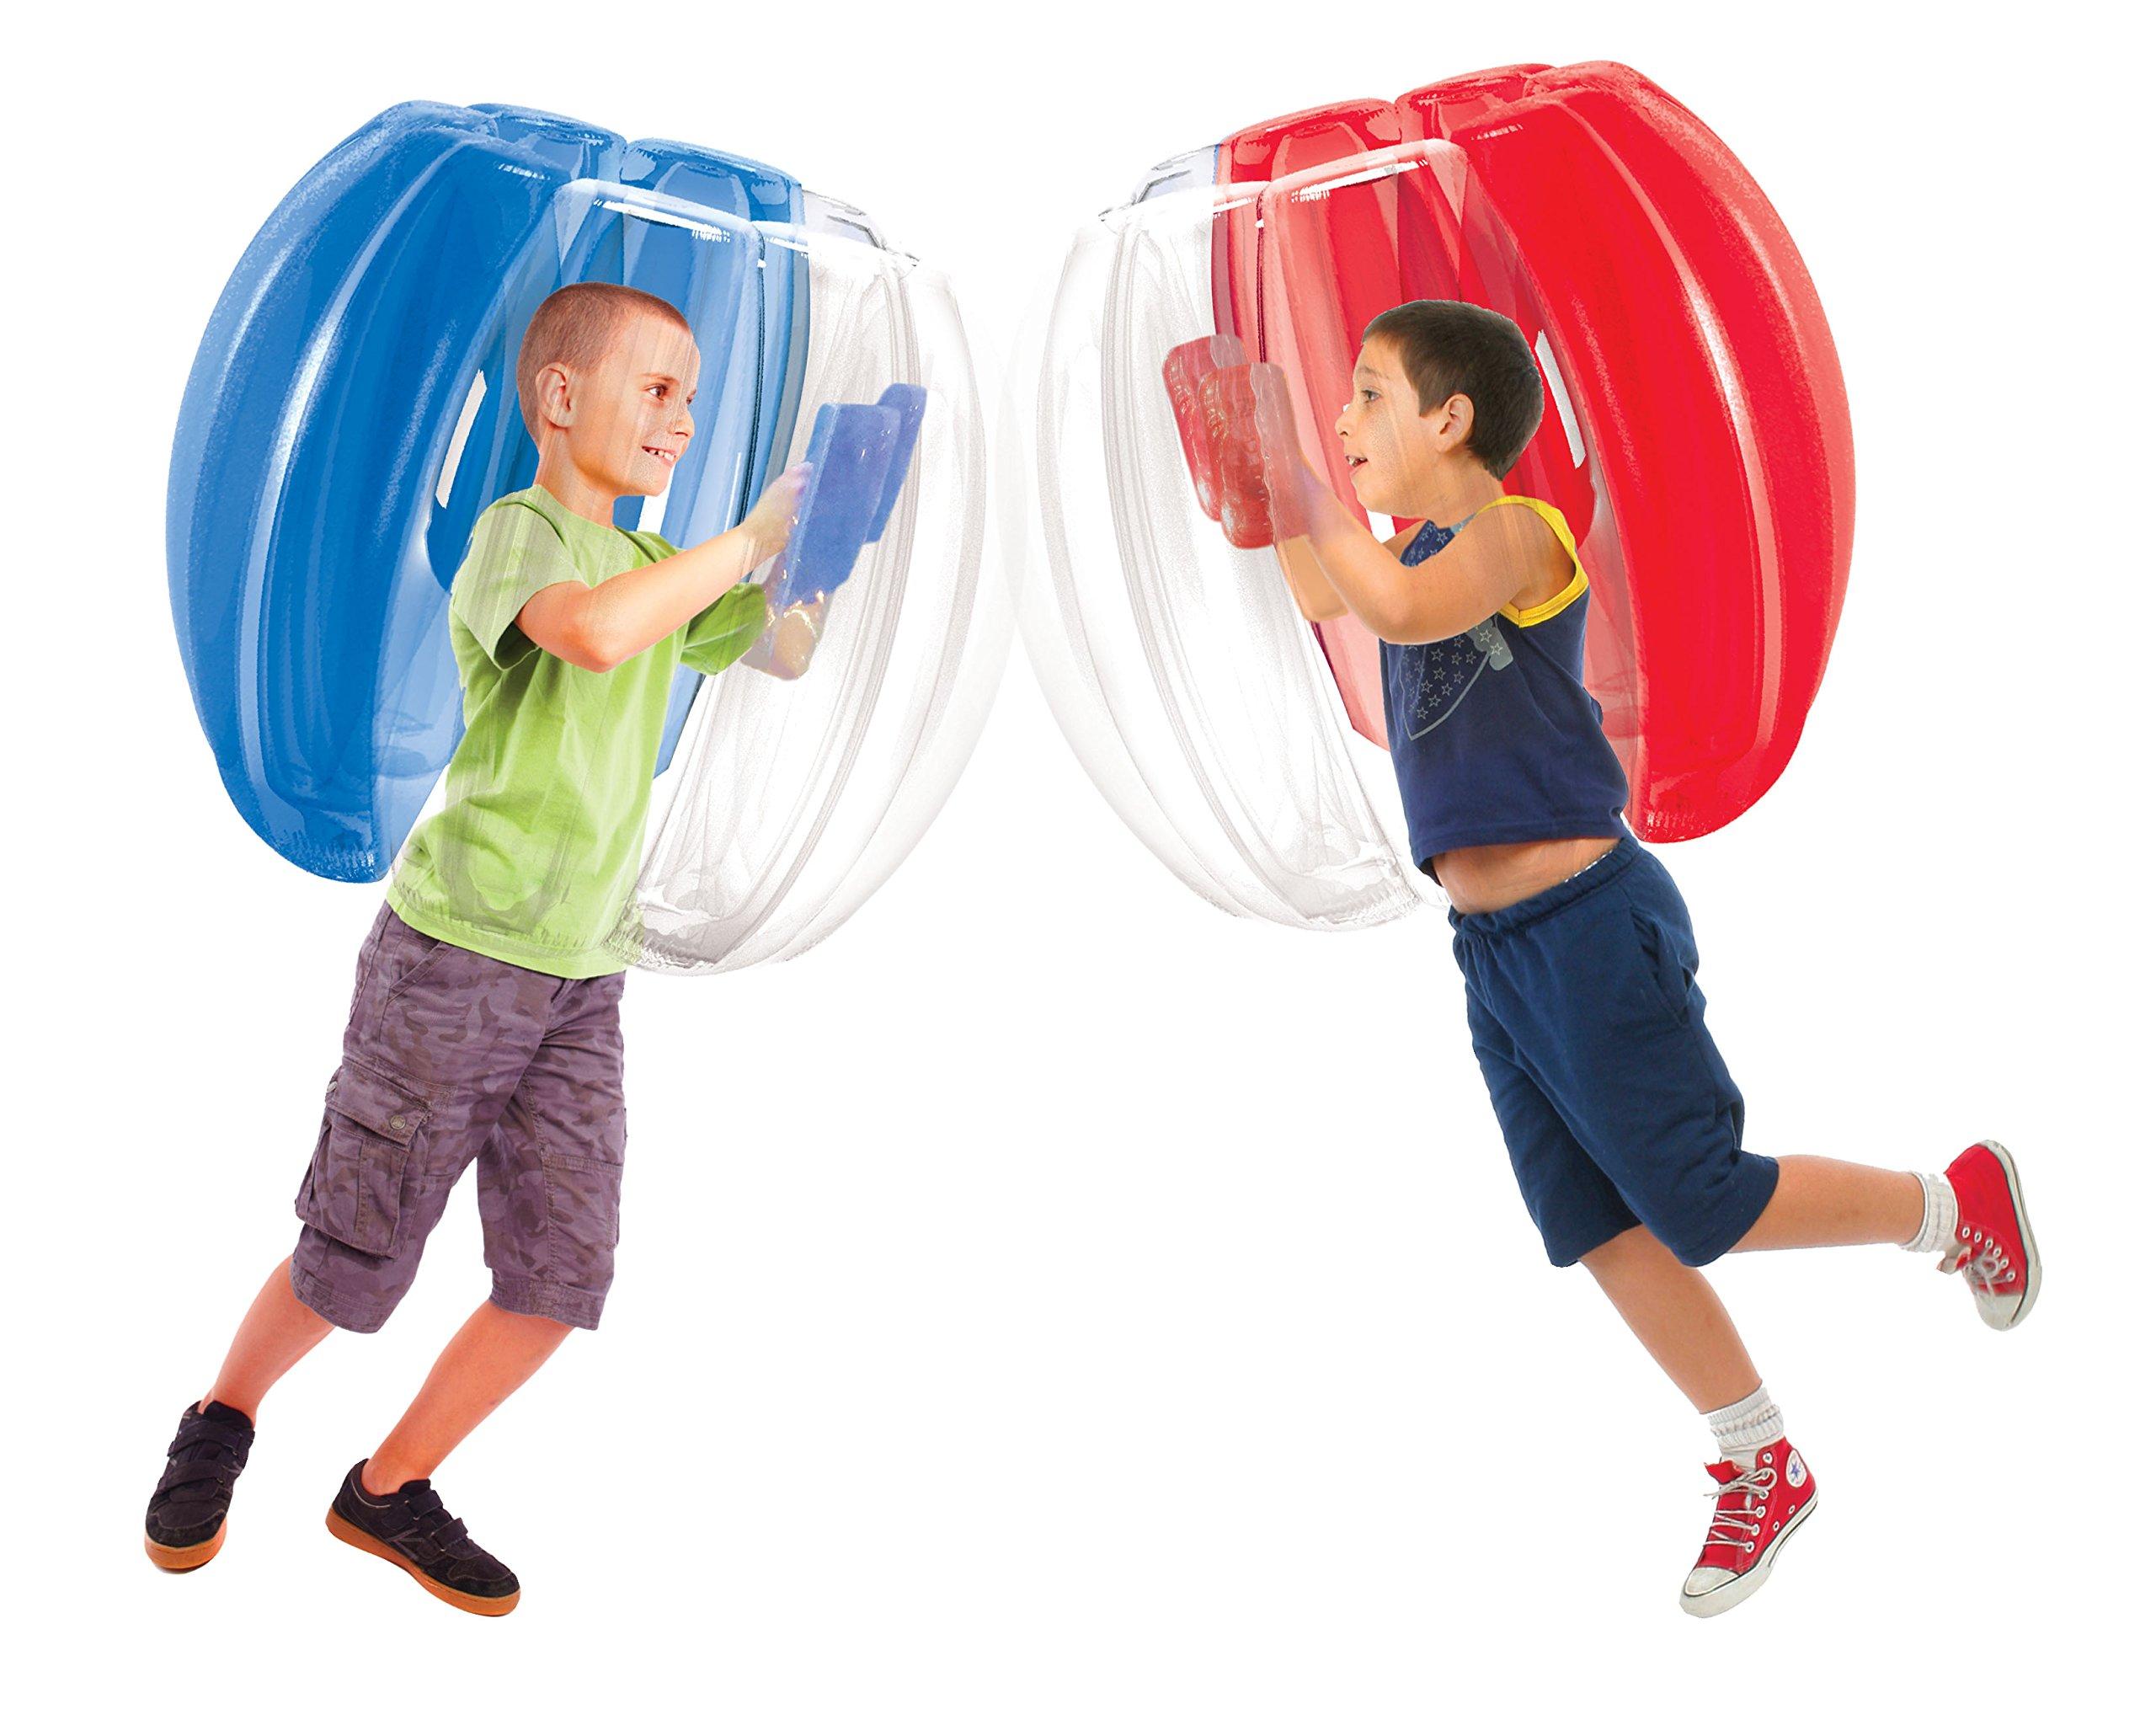 Socker Boppers BubbleBOPPER Ball - Colors Will Vary